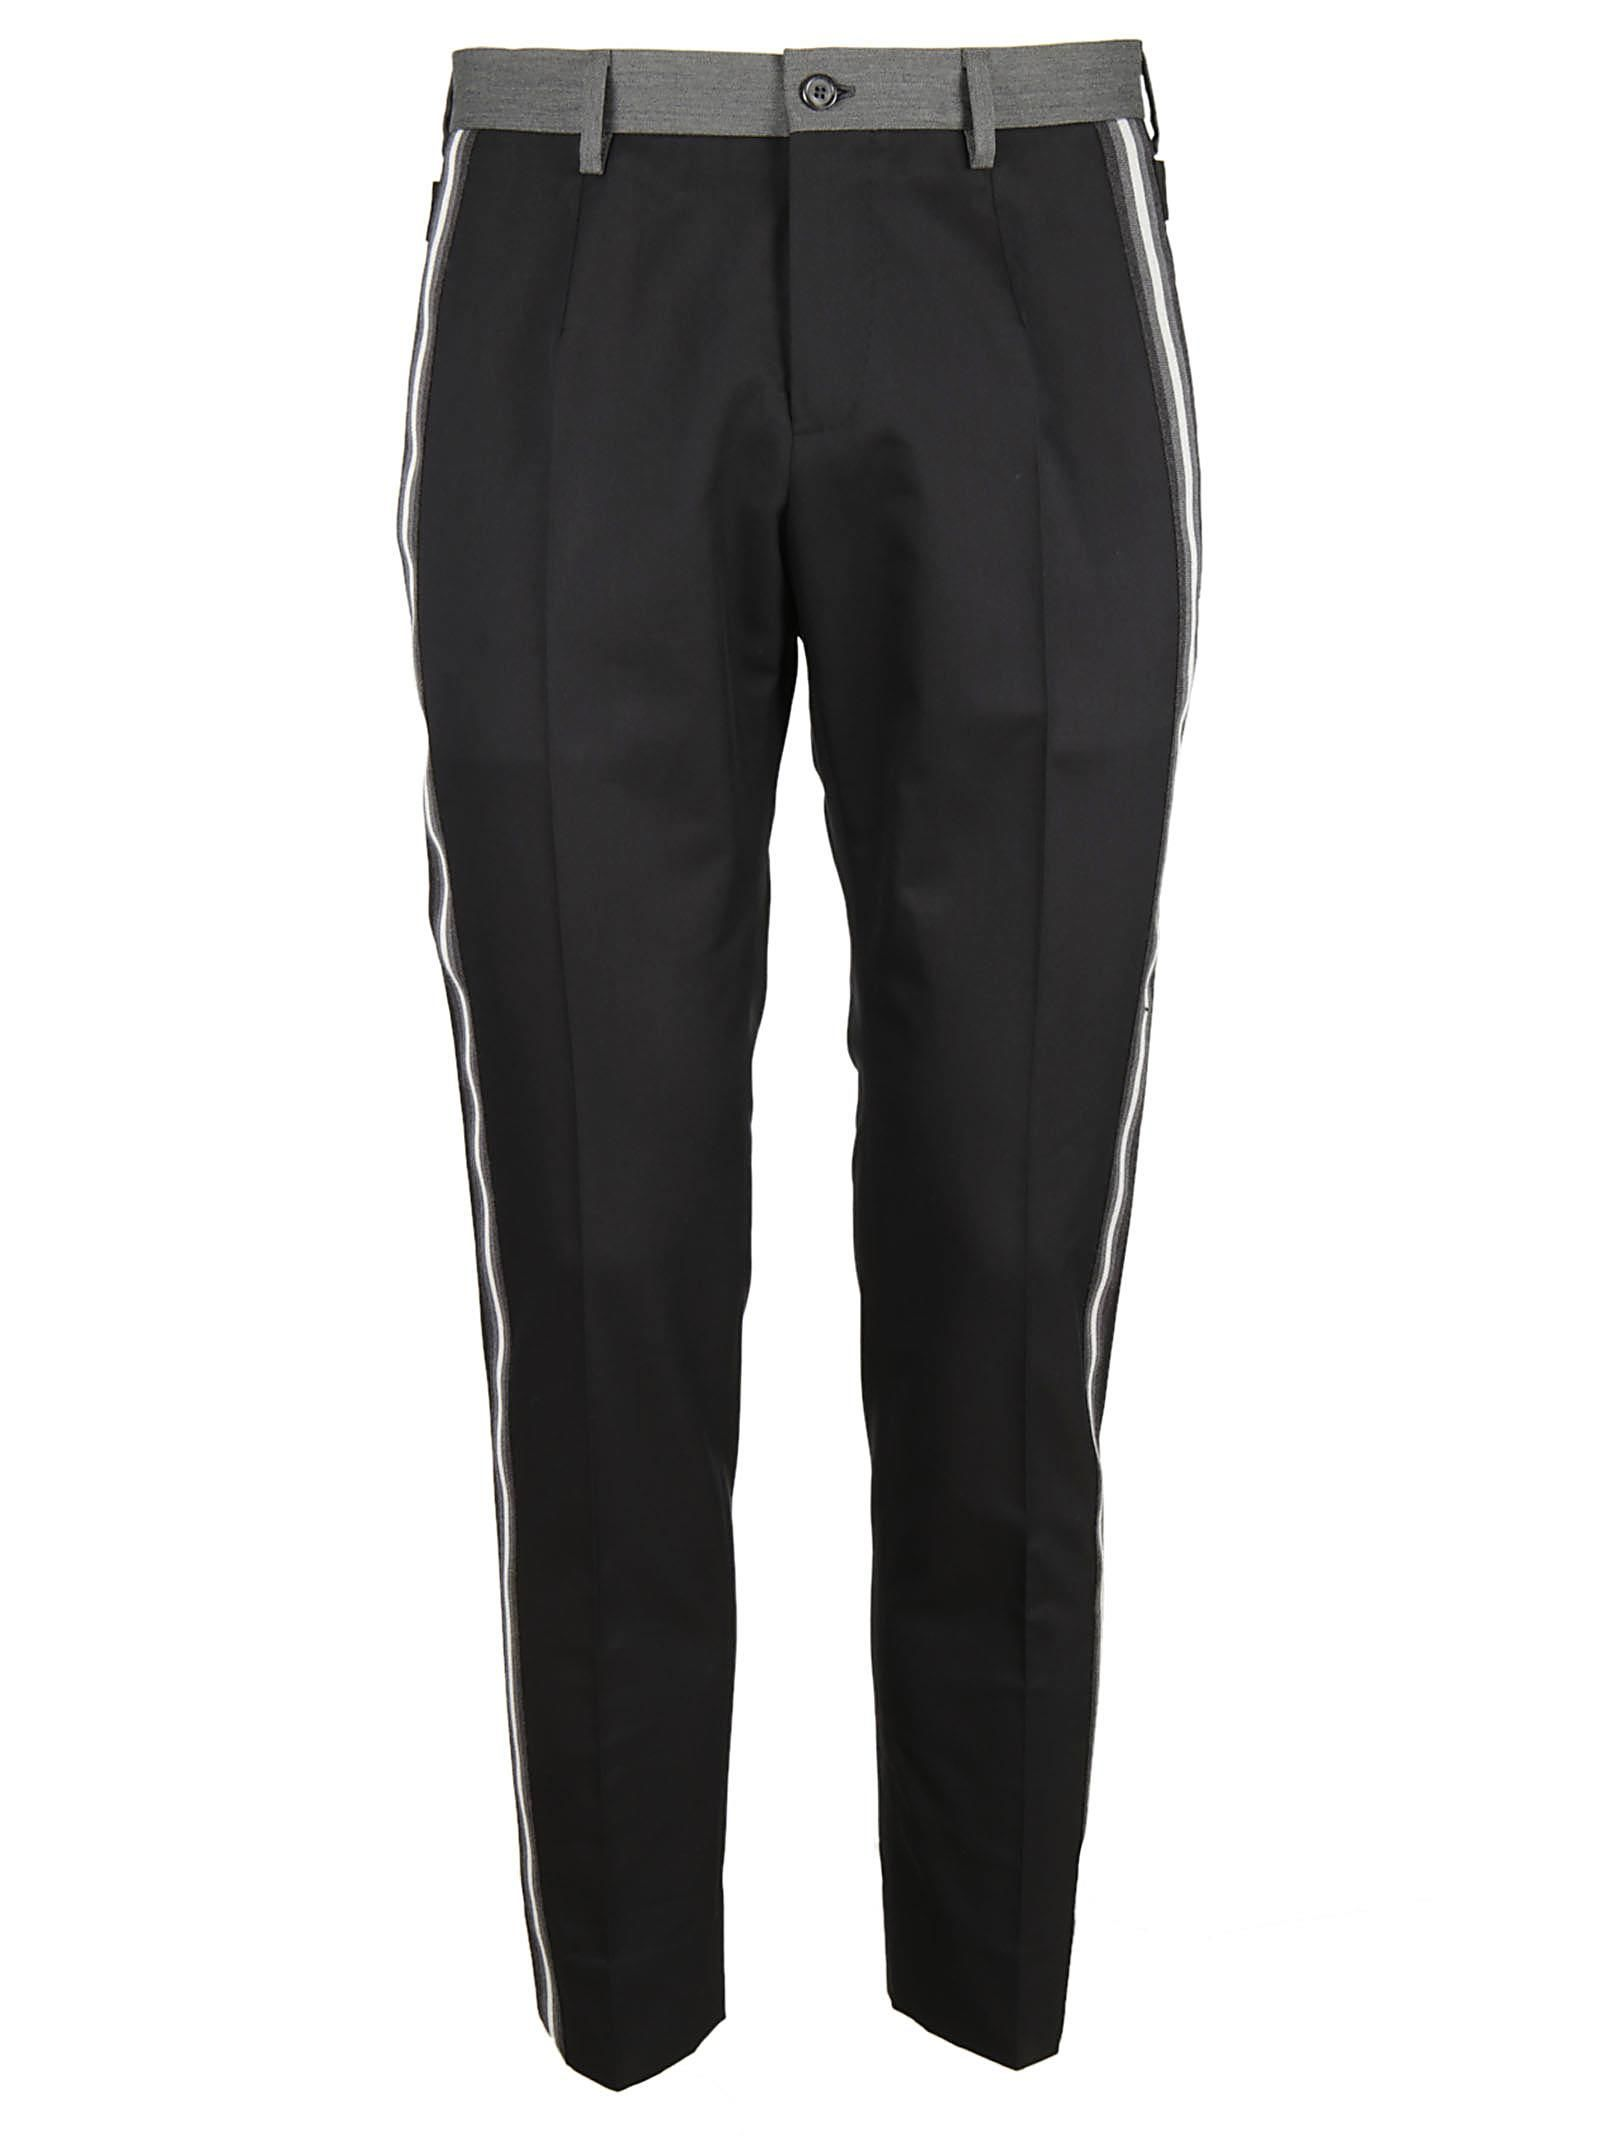 Dolce & Gabbana Stripe Trim Trousers